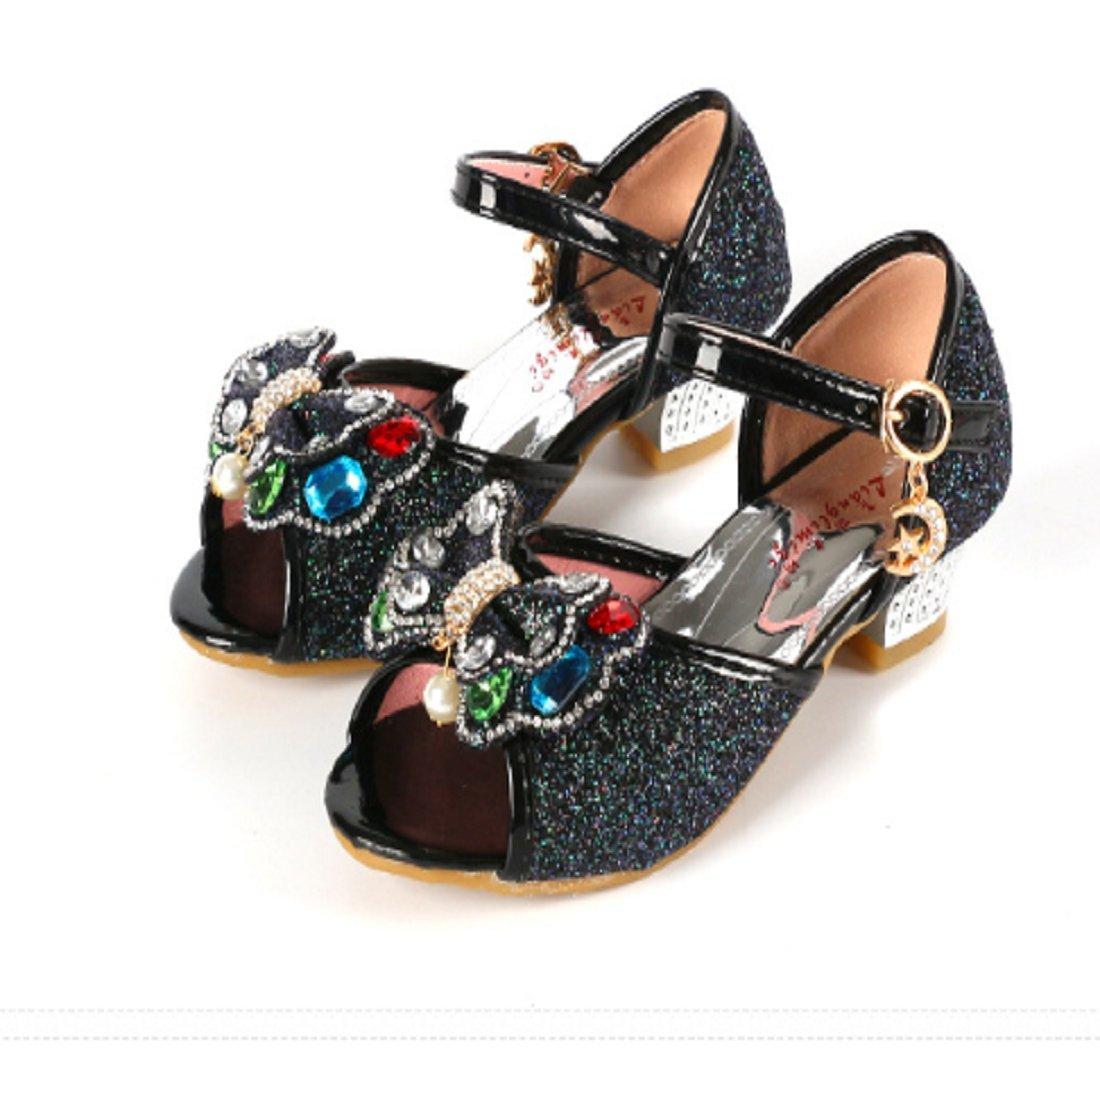 JTENGYAO Baby Girls Princess Wedding Party Glitter Shoes by JTENGYAO